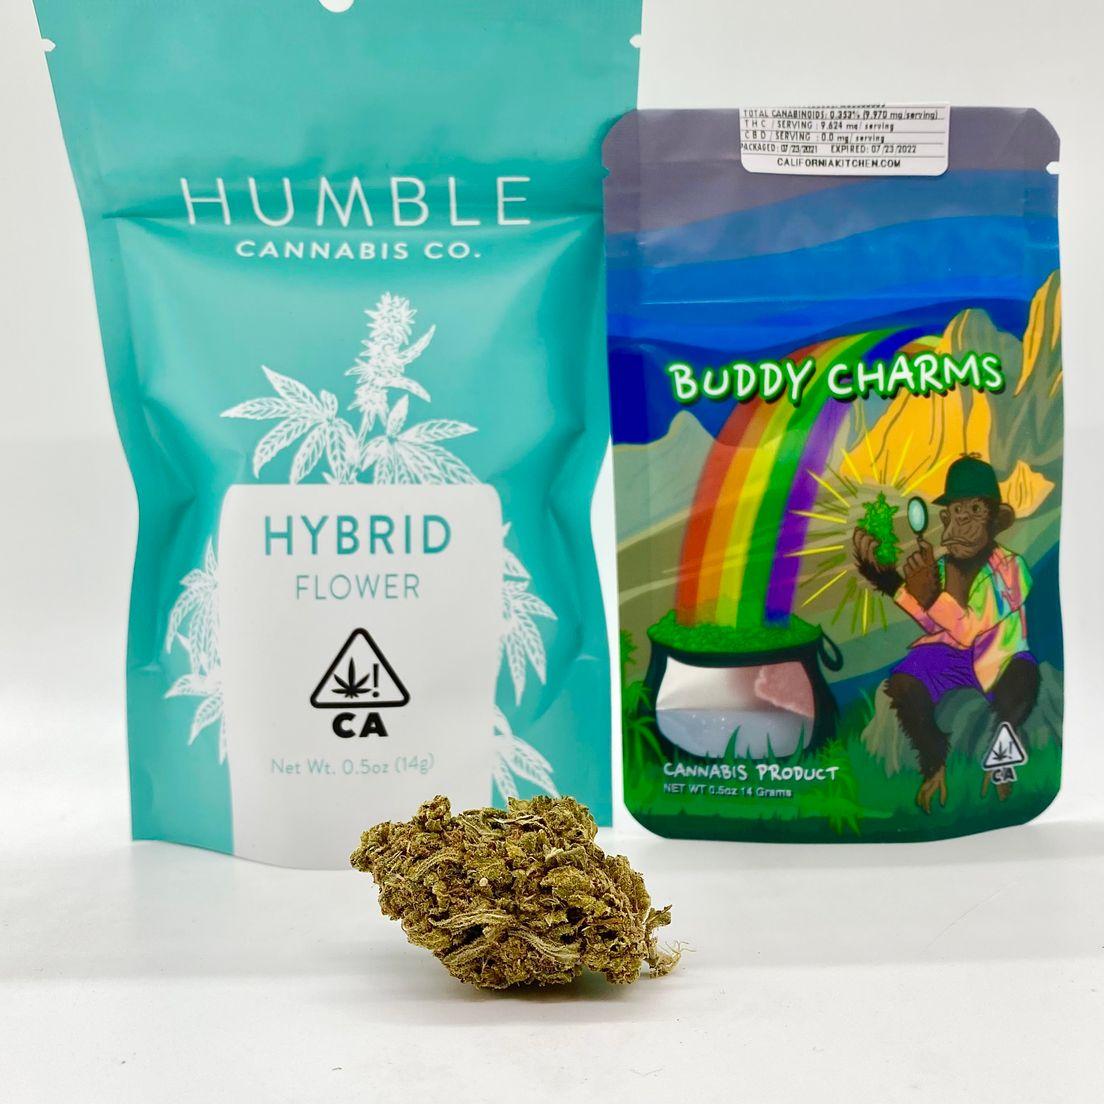 *Deal! $55 1/2 oz. Mendo Breath (26.97%/Indica)-Humble Cannabis Co. + Buddy Charms *Disclaimer*